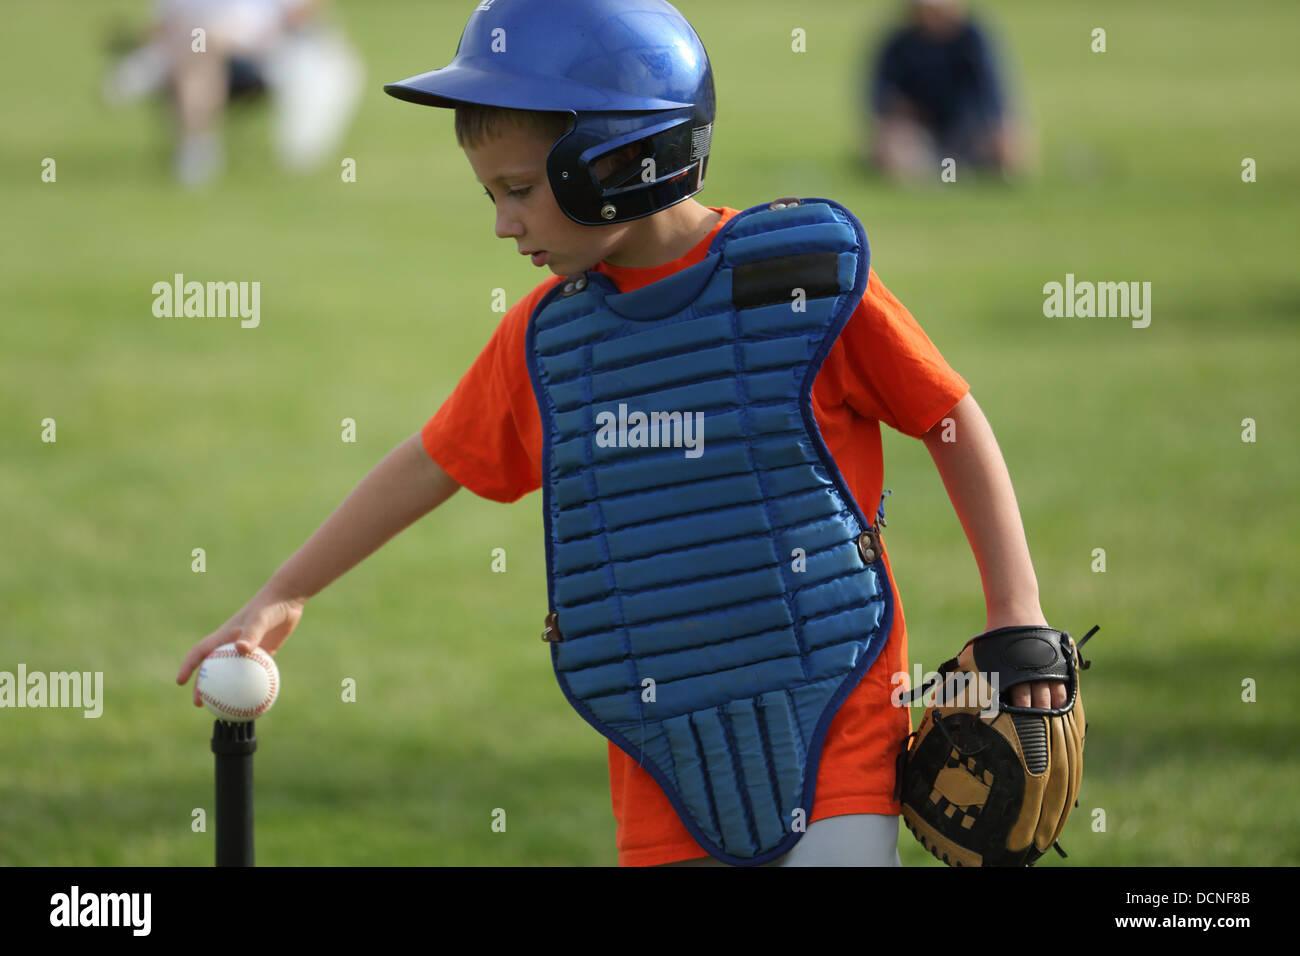 Jeune garçon met sur baseball tee Photo Stock